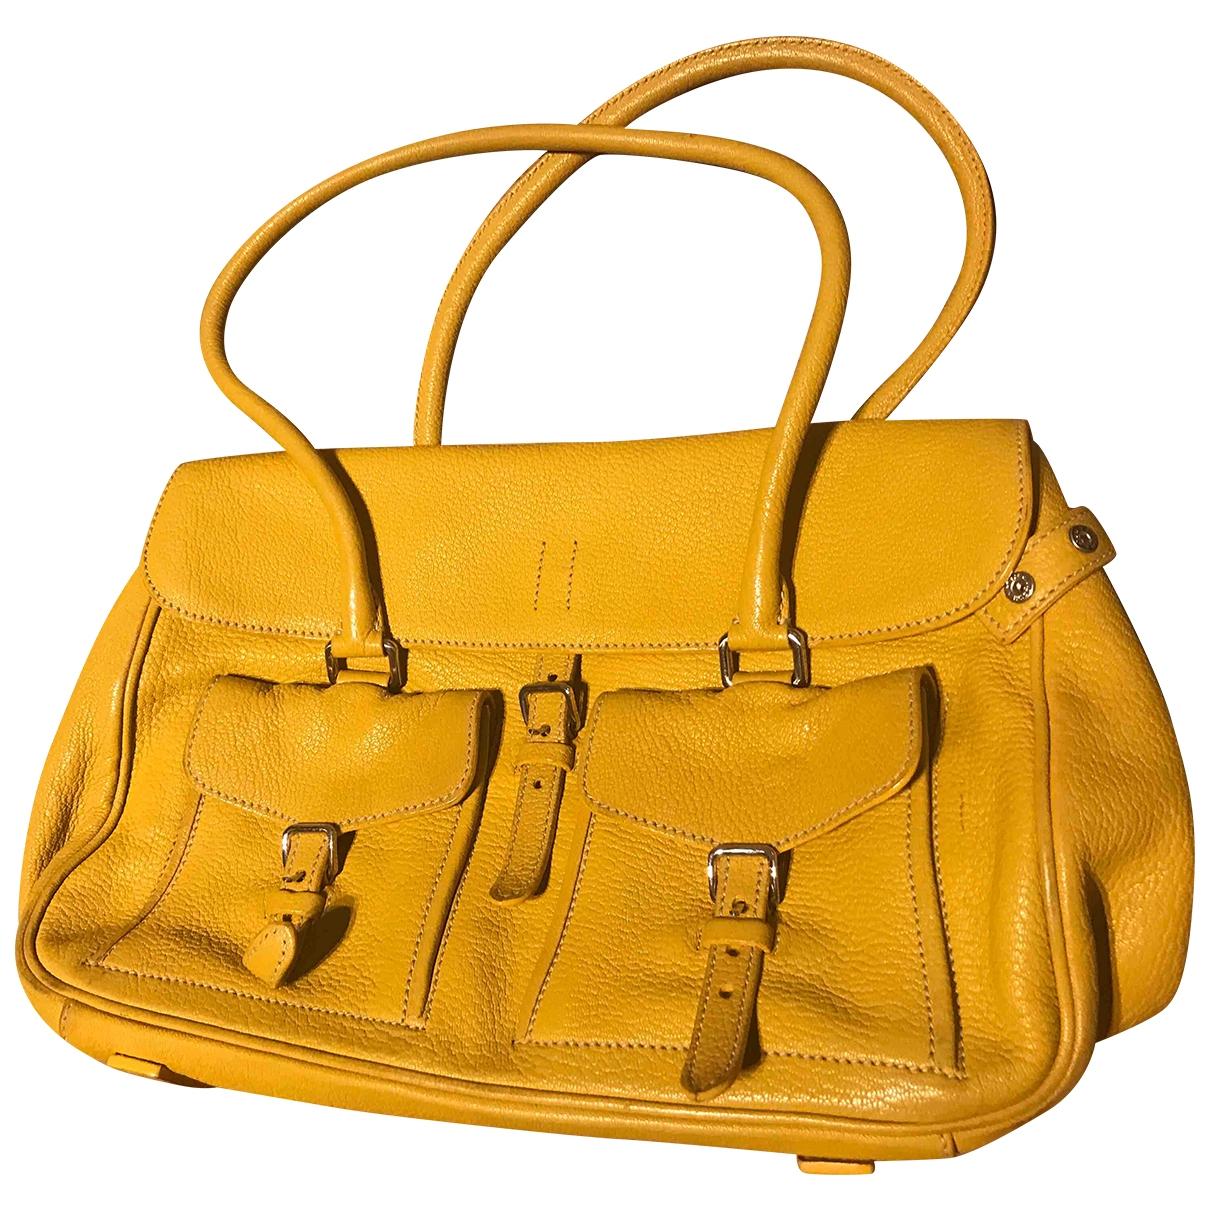 Jil Sander \N Yellow Leather handbag for Women \N